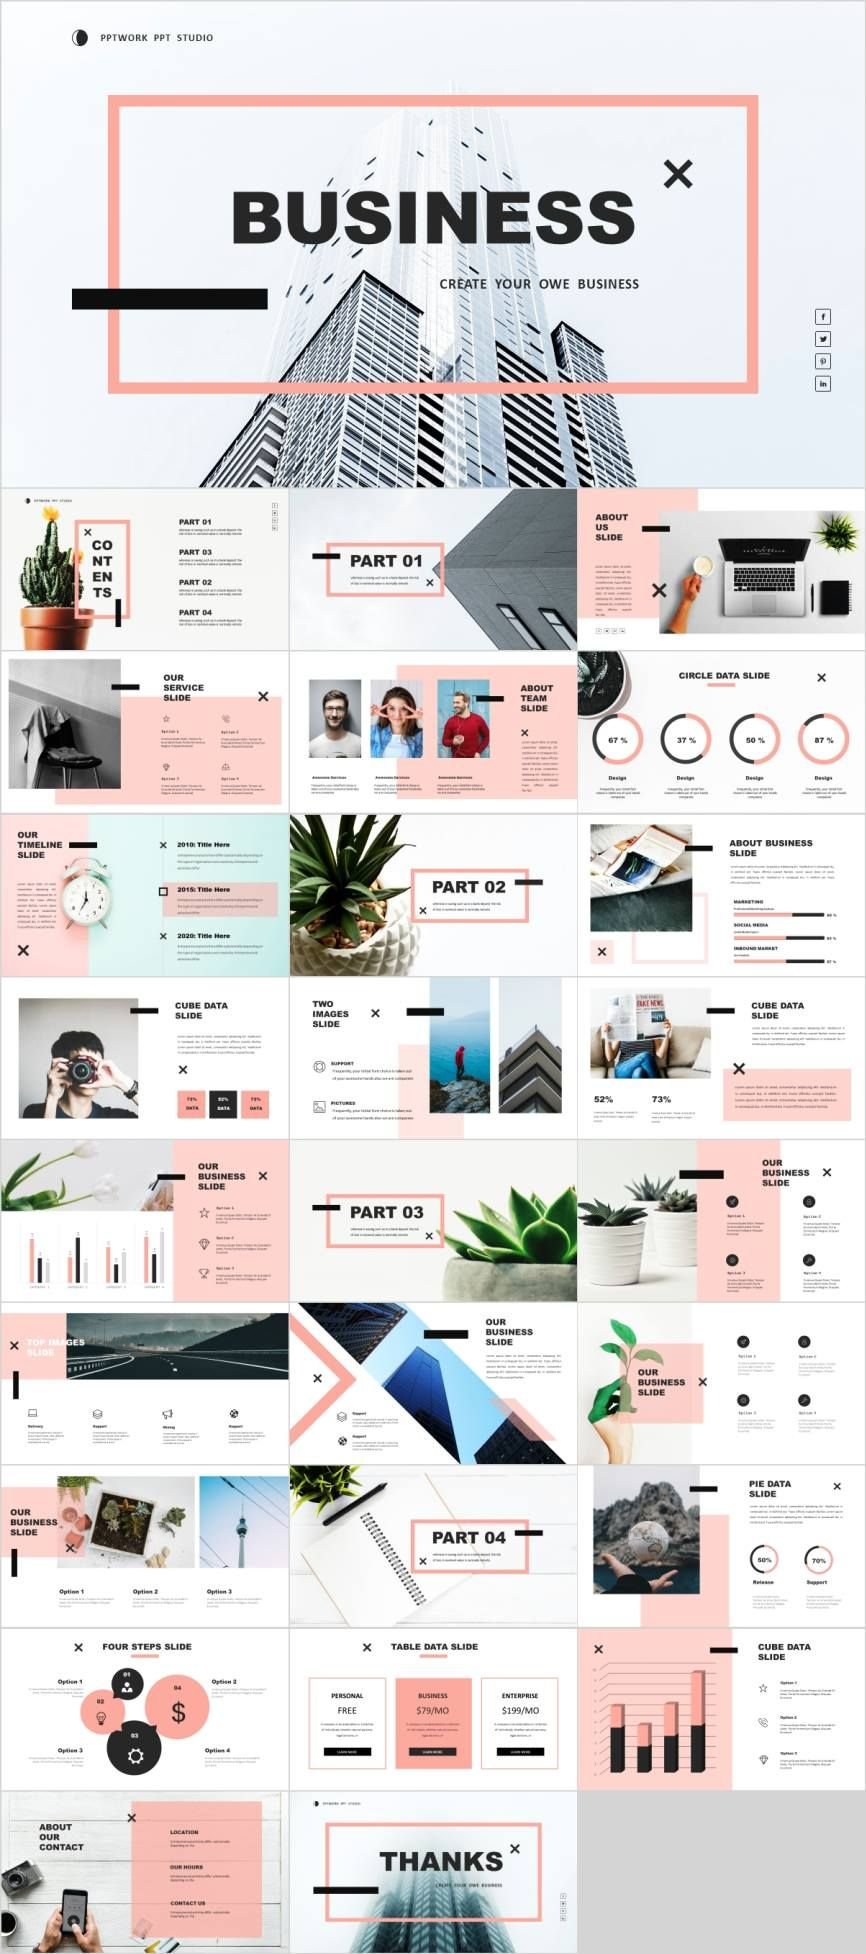 Multipurpose And Minimal Design Powerpoint Template Pcslide Com Powerpoint Presentation Design Powerpoint Design Templates Presentation Design Layout